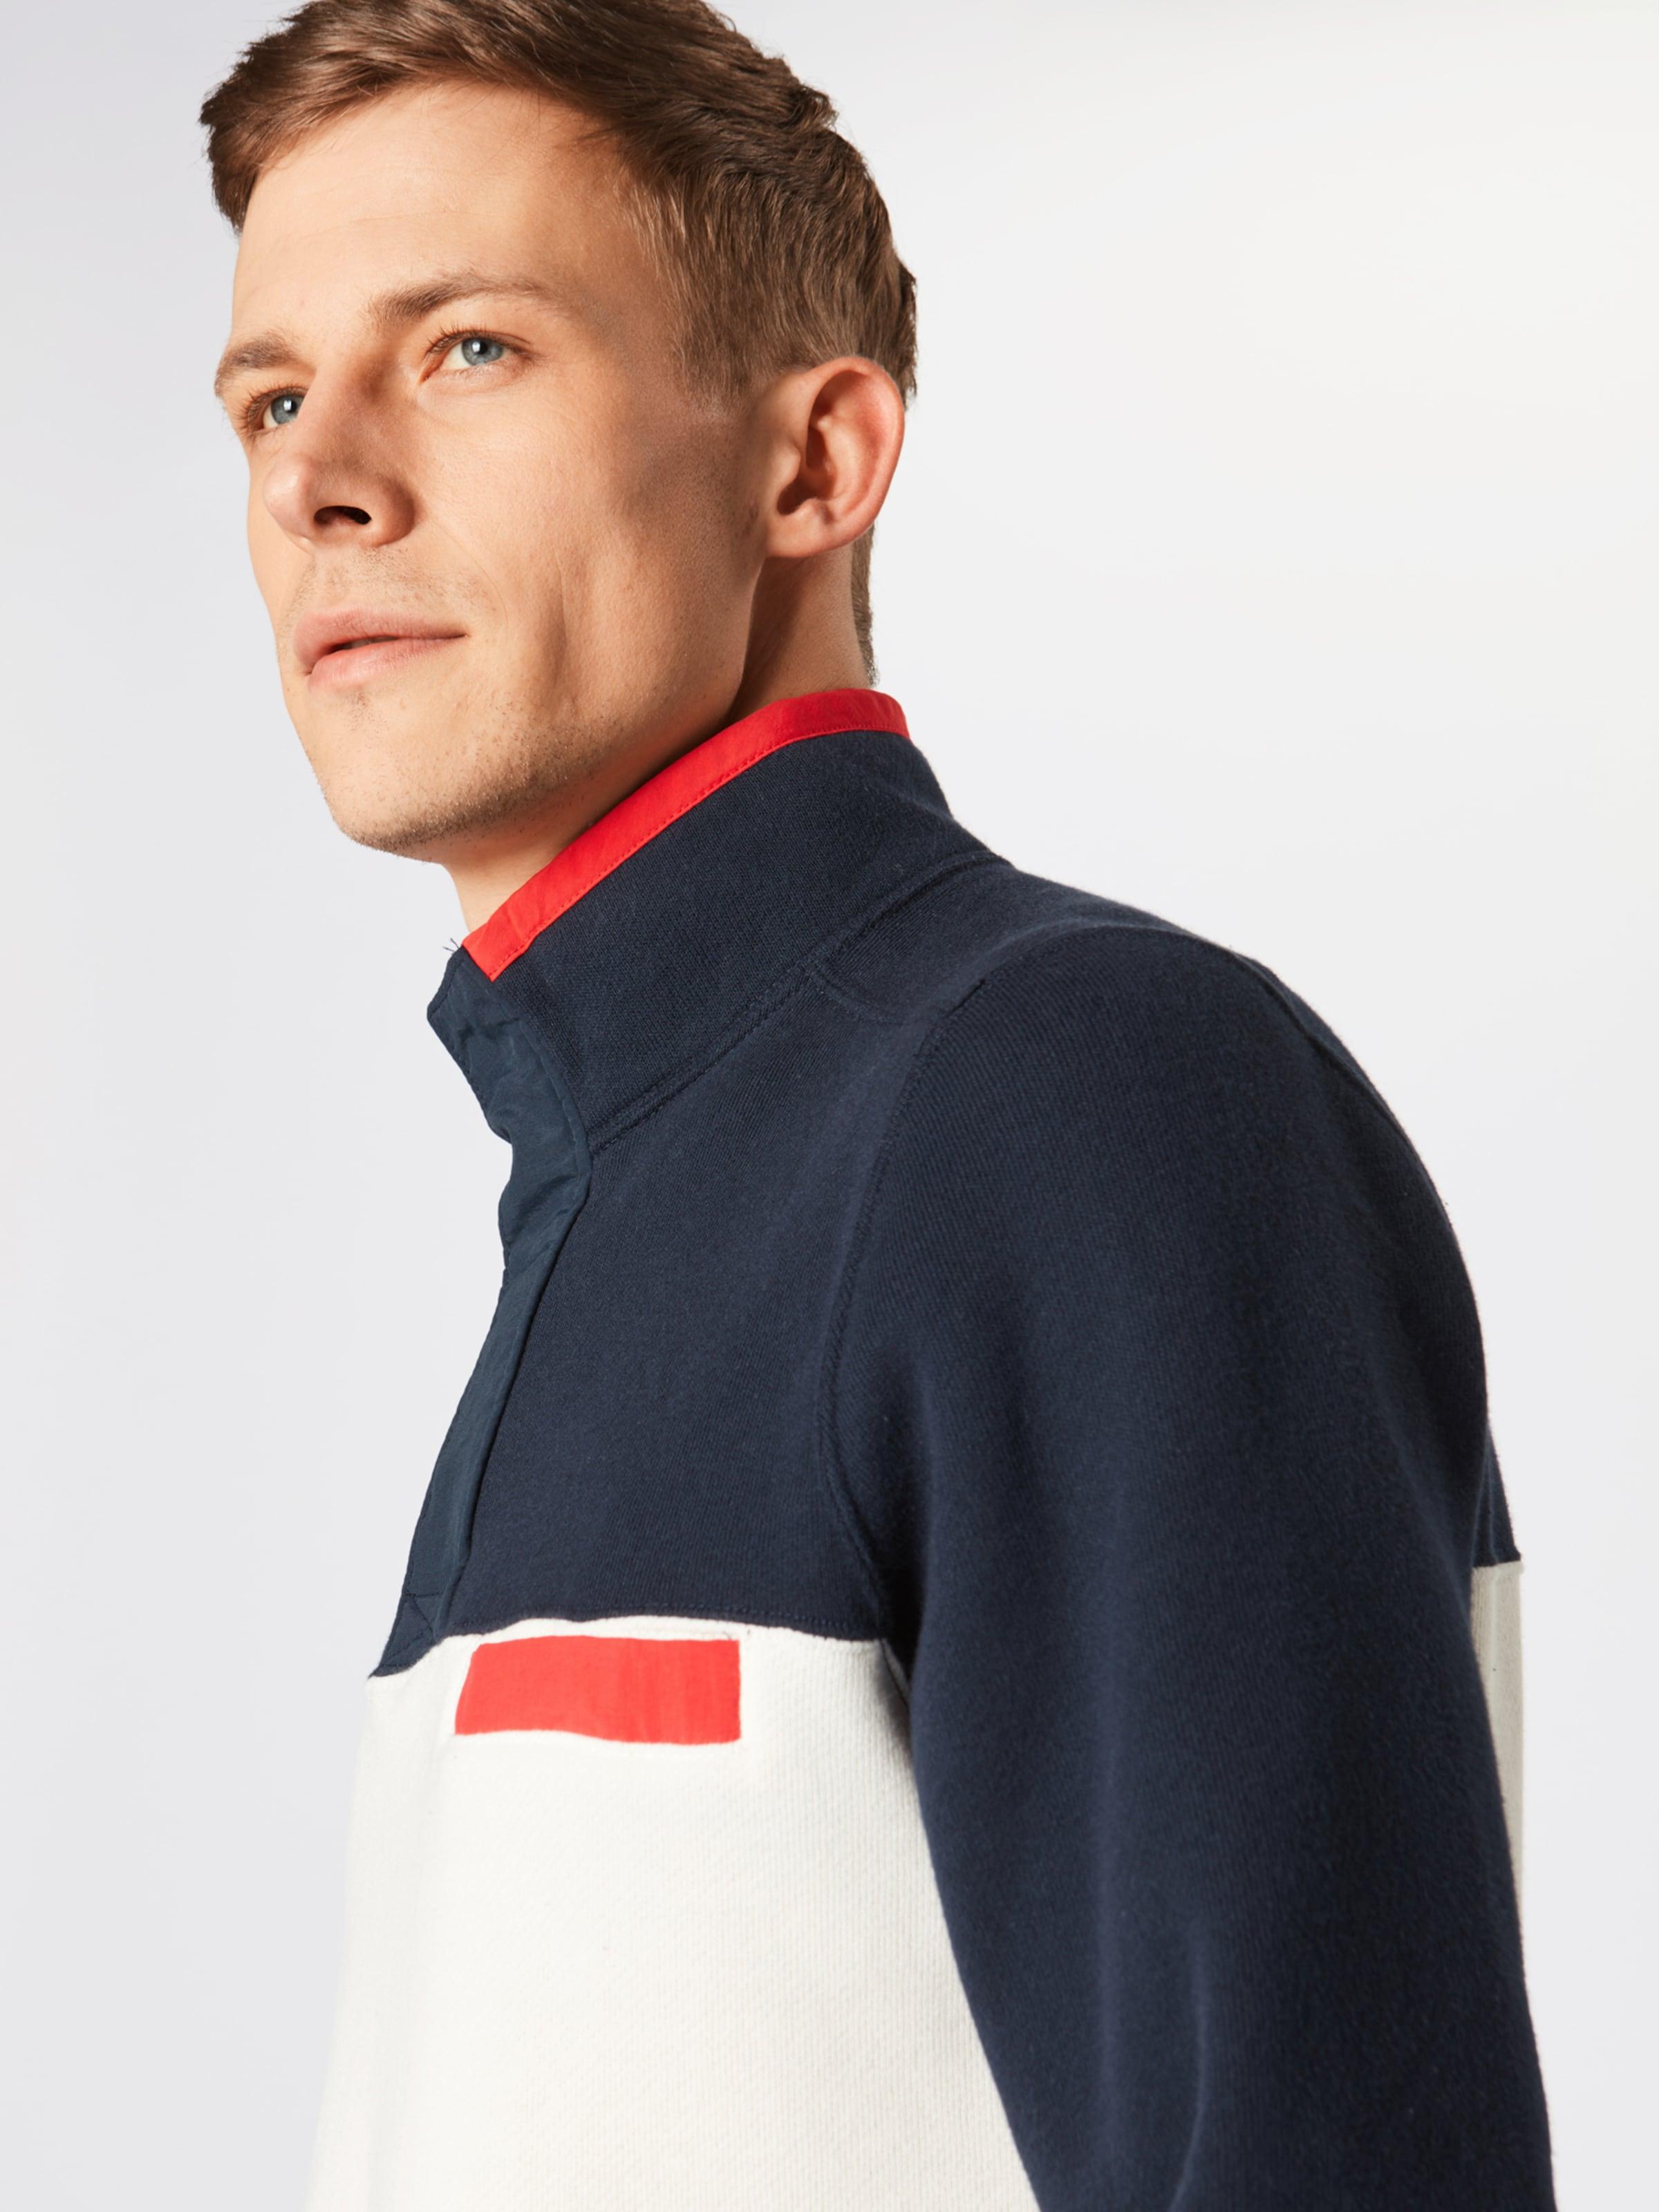 Abercrombieamp; shirt En MarineBlanc Nylon 'blocked Sweat Mock' Bleu Hz Fitch NnP8OXZk0w